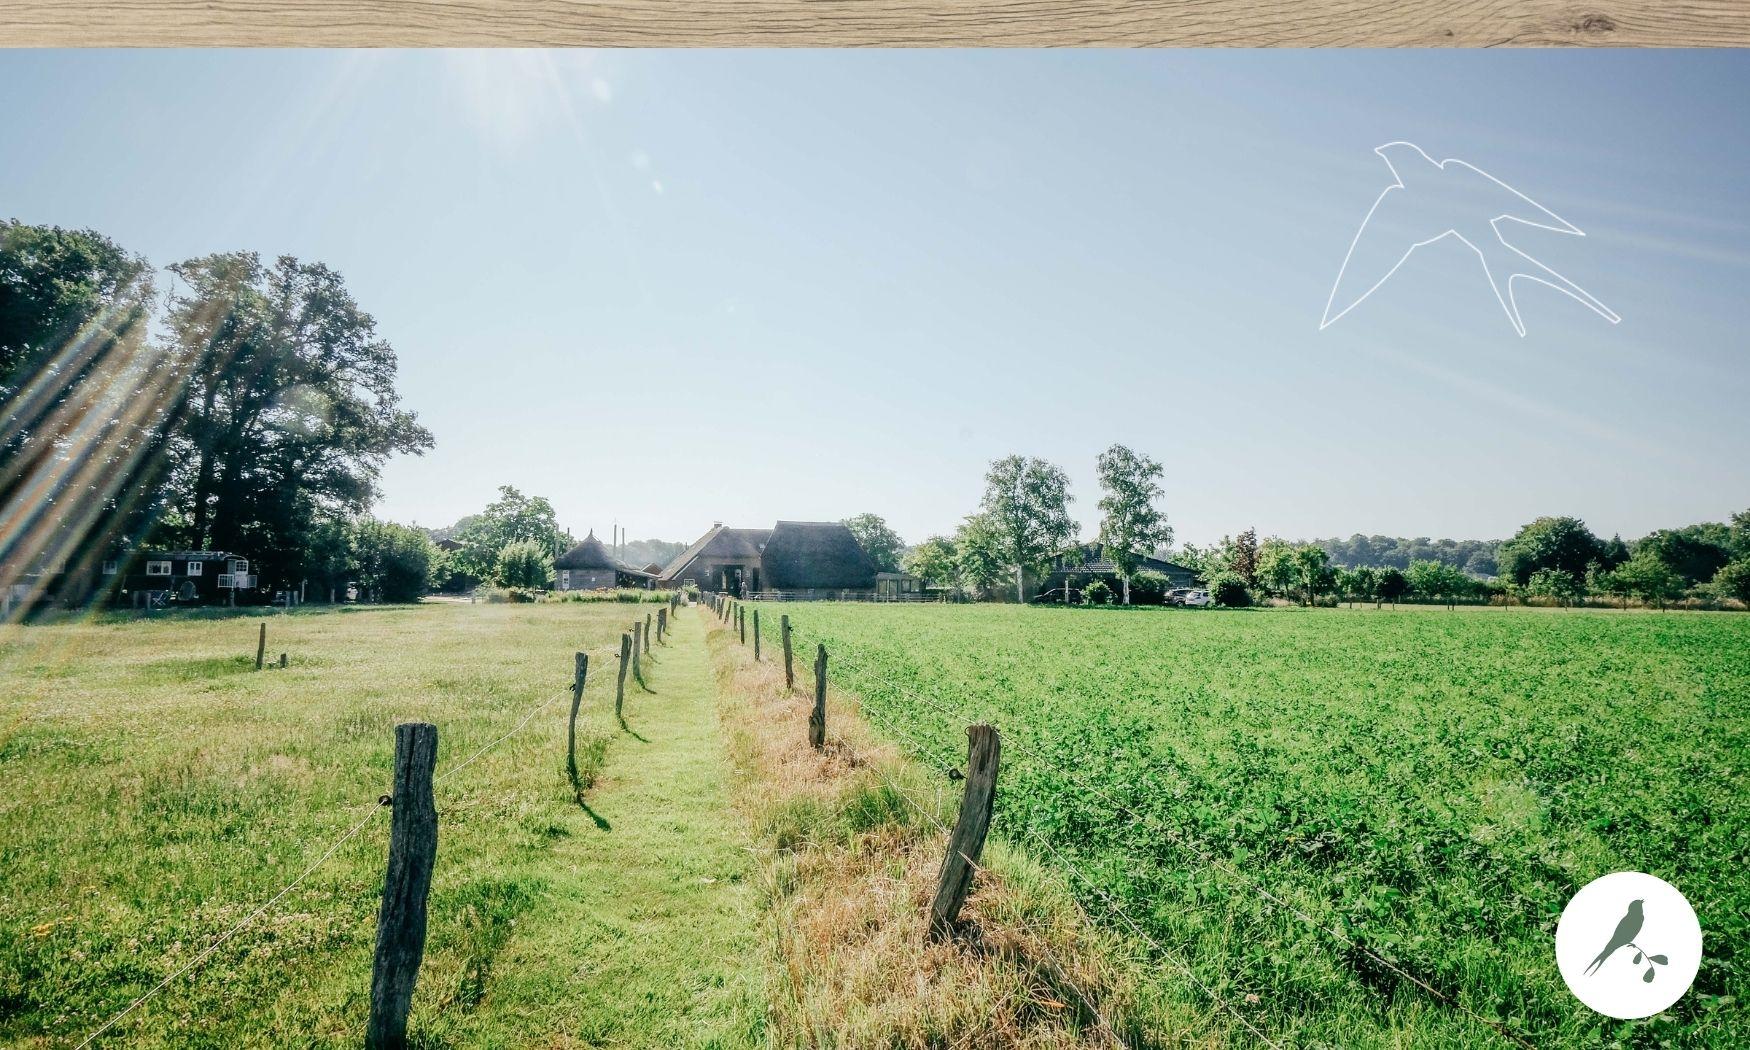 de kleine wildenberg -agritoerismo - agritoerisme - boerderijvakantie